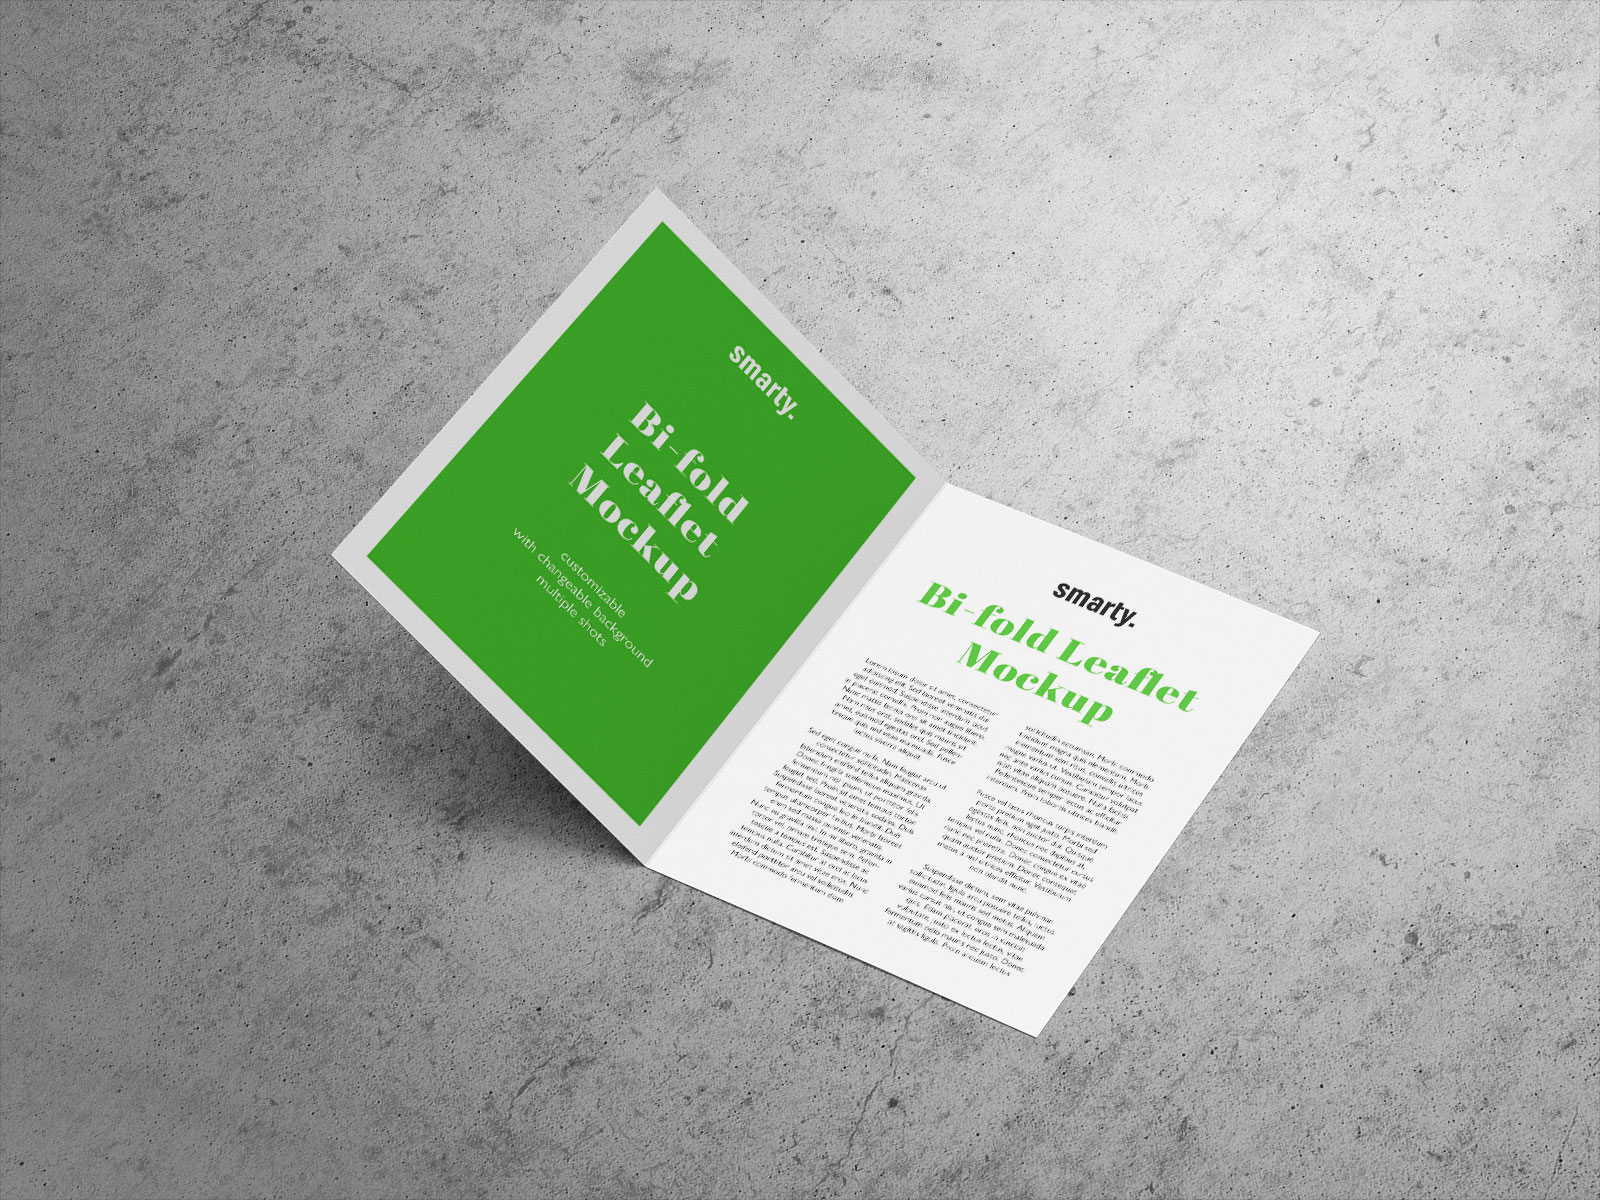 free a5 bi fold brochure leaflet mockup psd good mockups